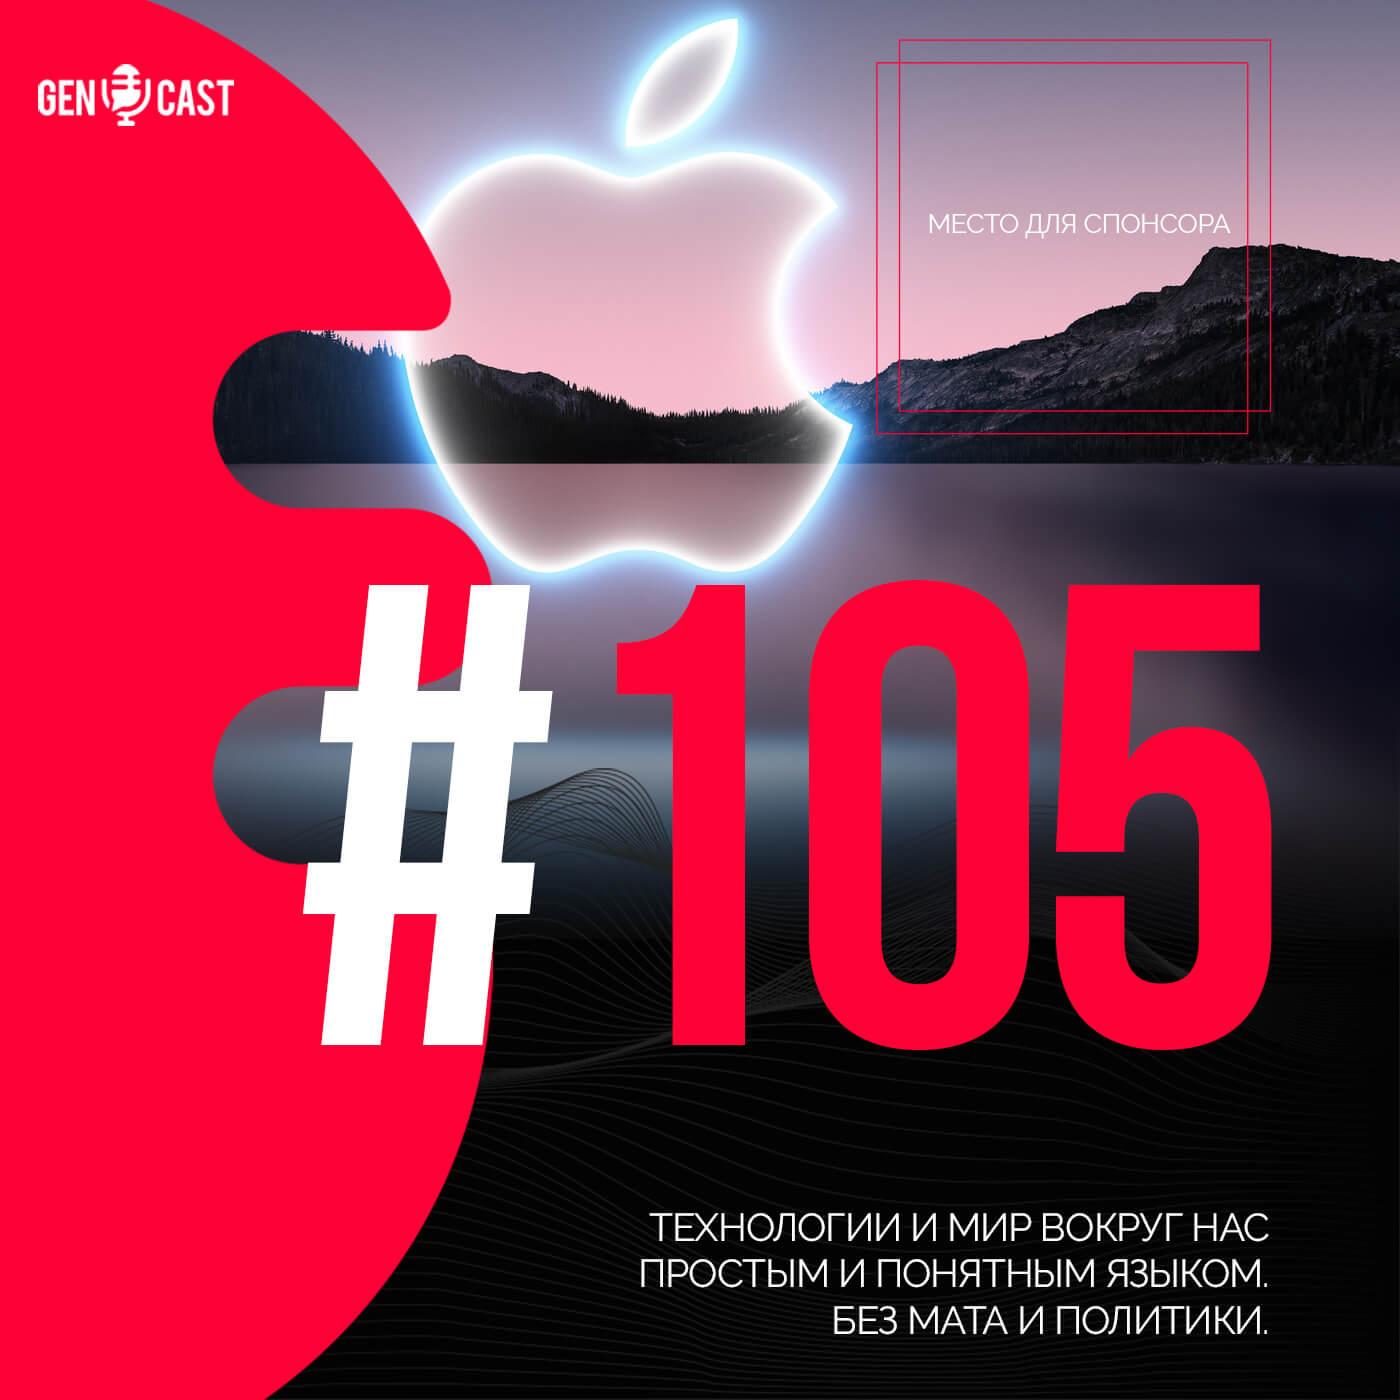 Презентация Apple «California streaming». Свежие впечатления. Новый iPad mini, iPhone 13, Apple Watch 7.